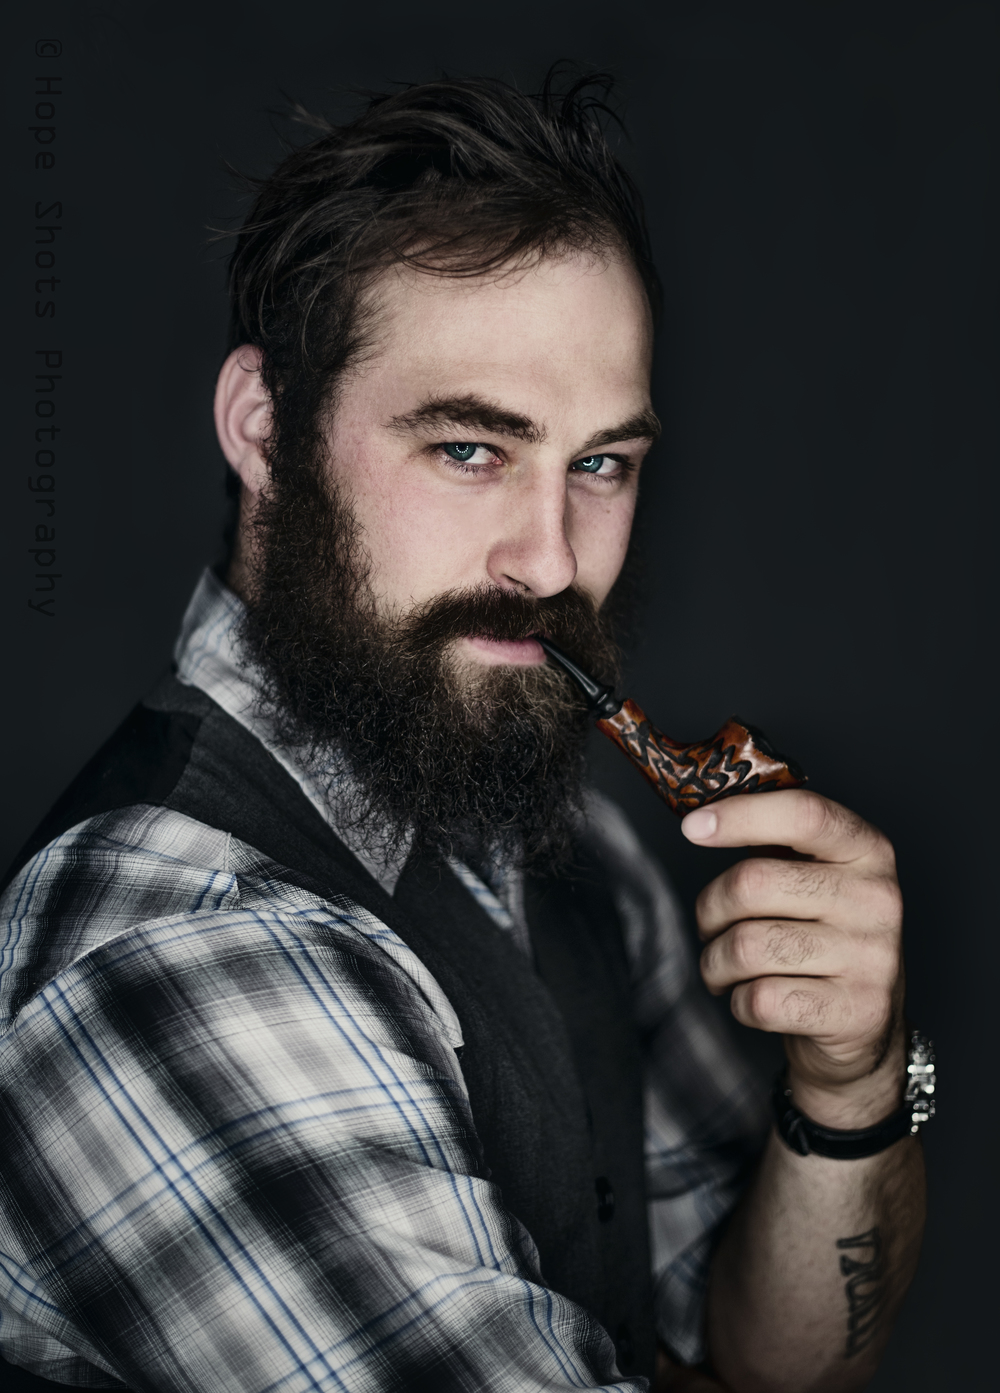 Beards-119.jpg